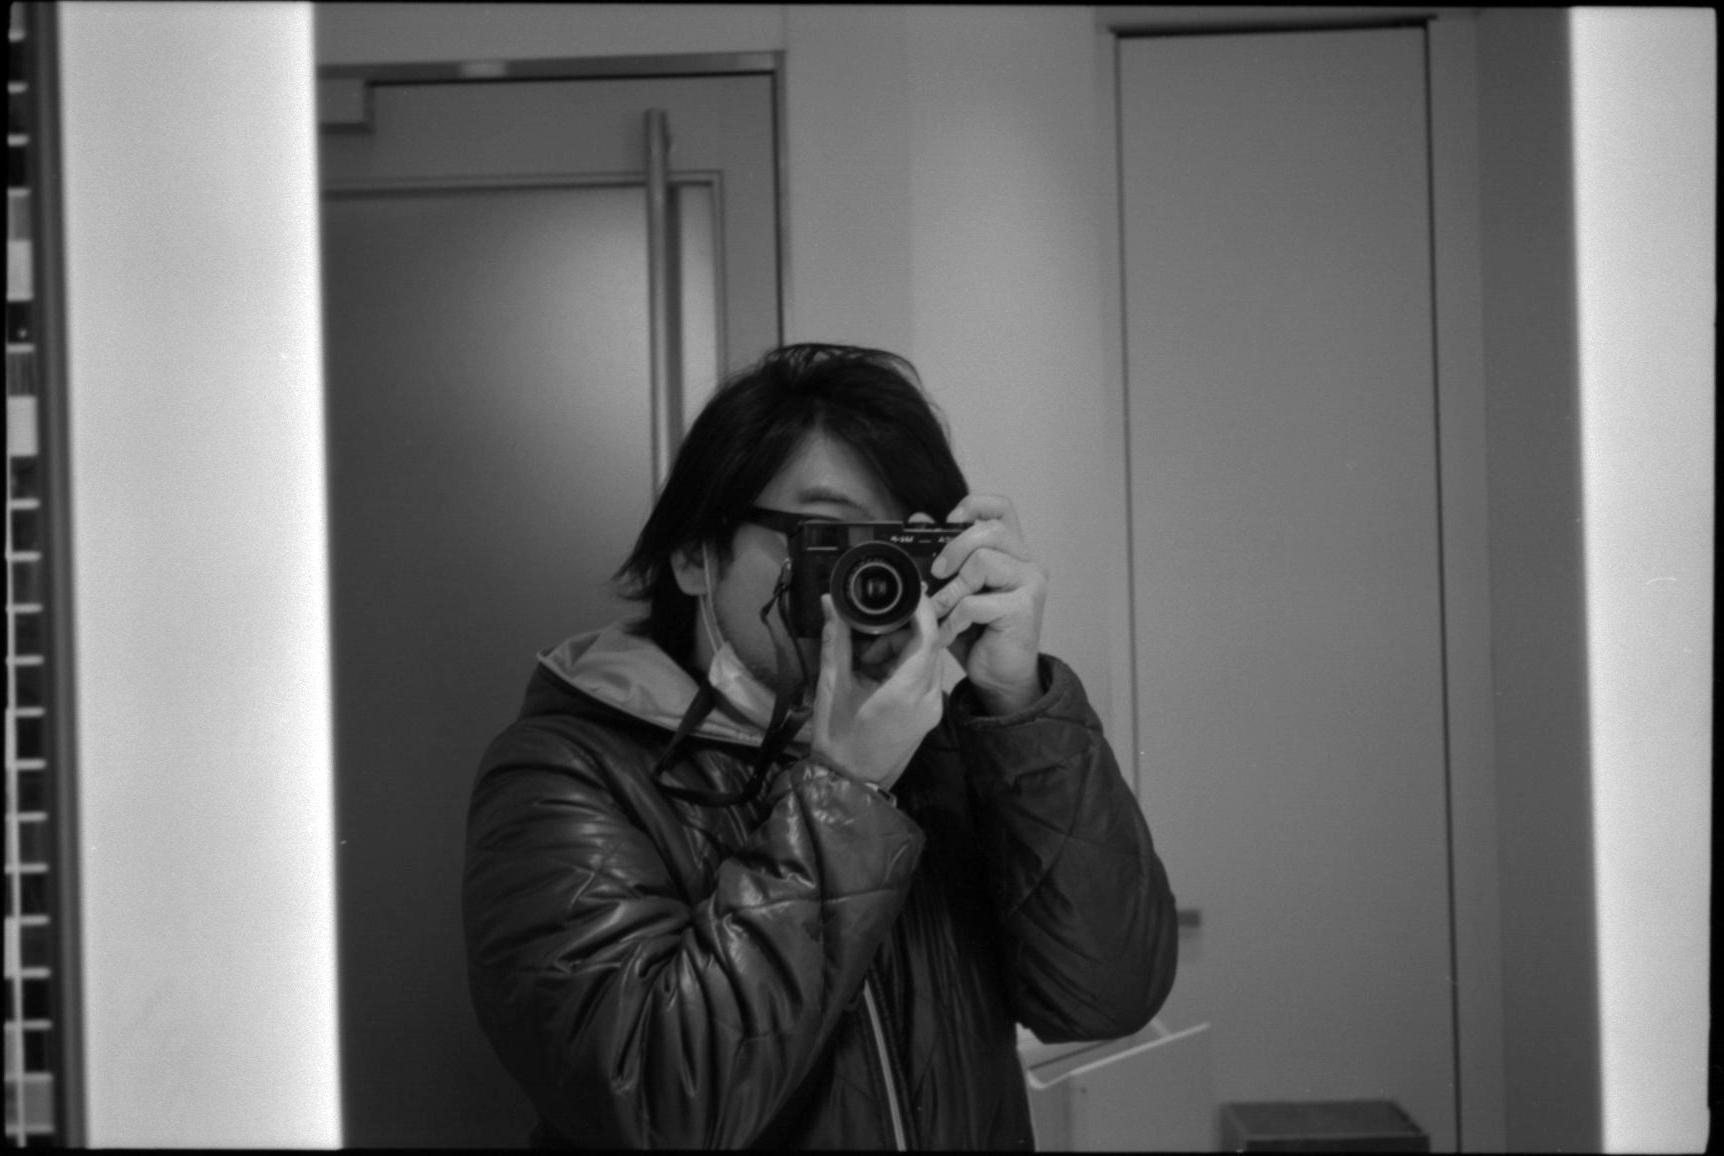 20131212 LeicaM4-P summaron35 np100 spd 011